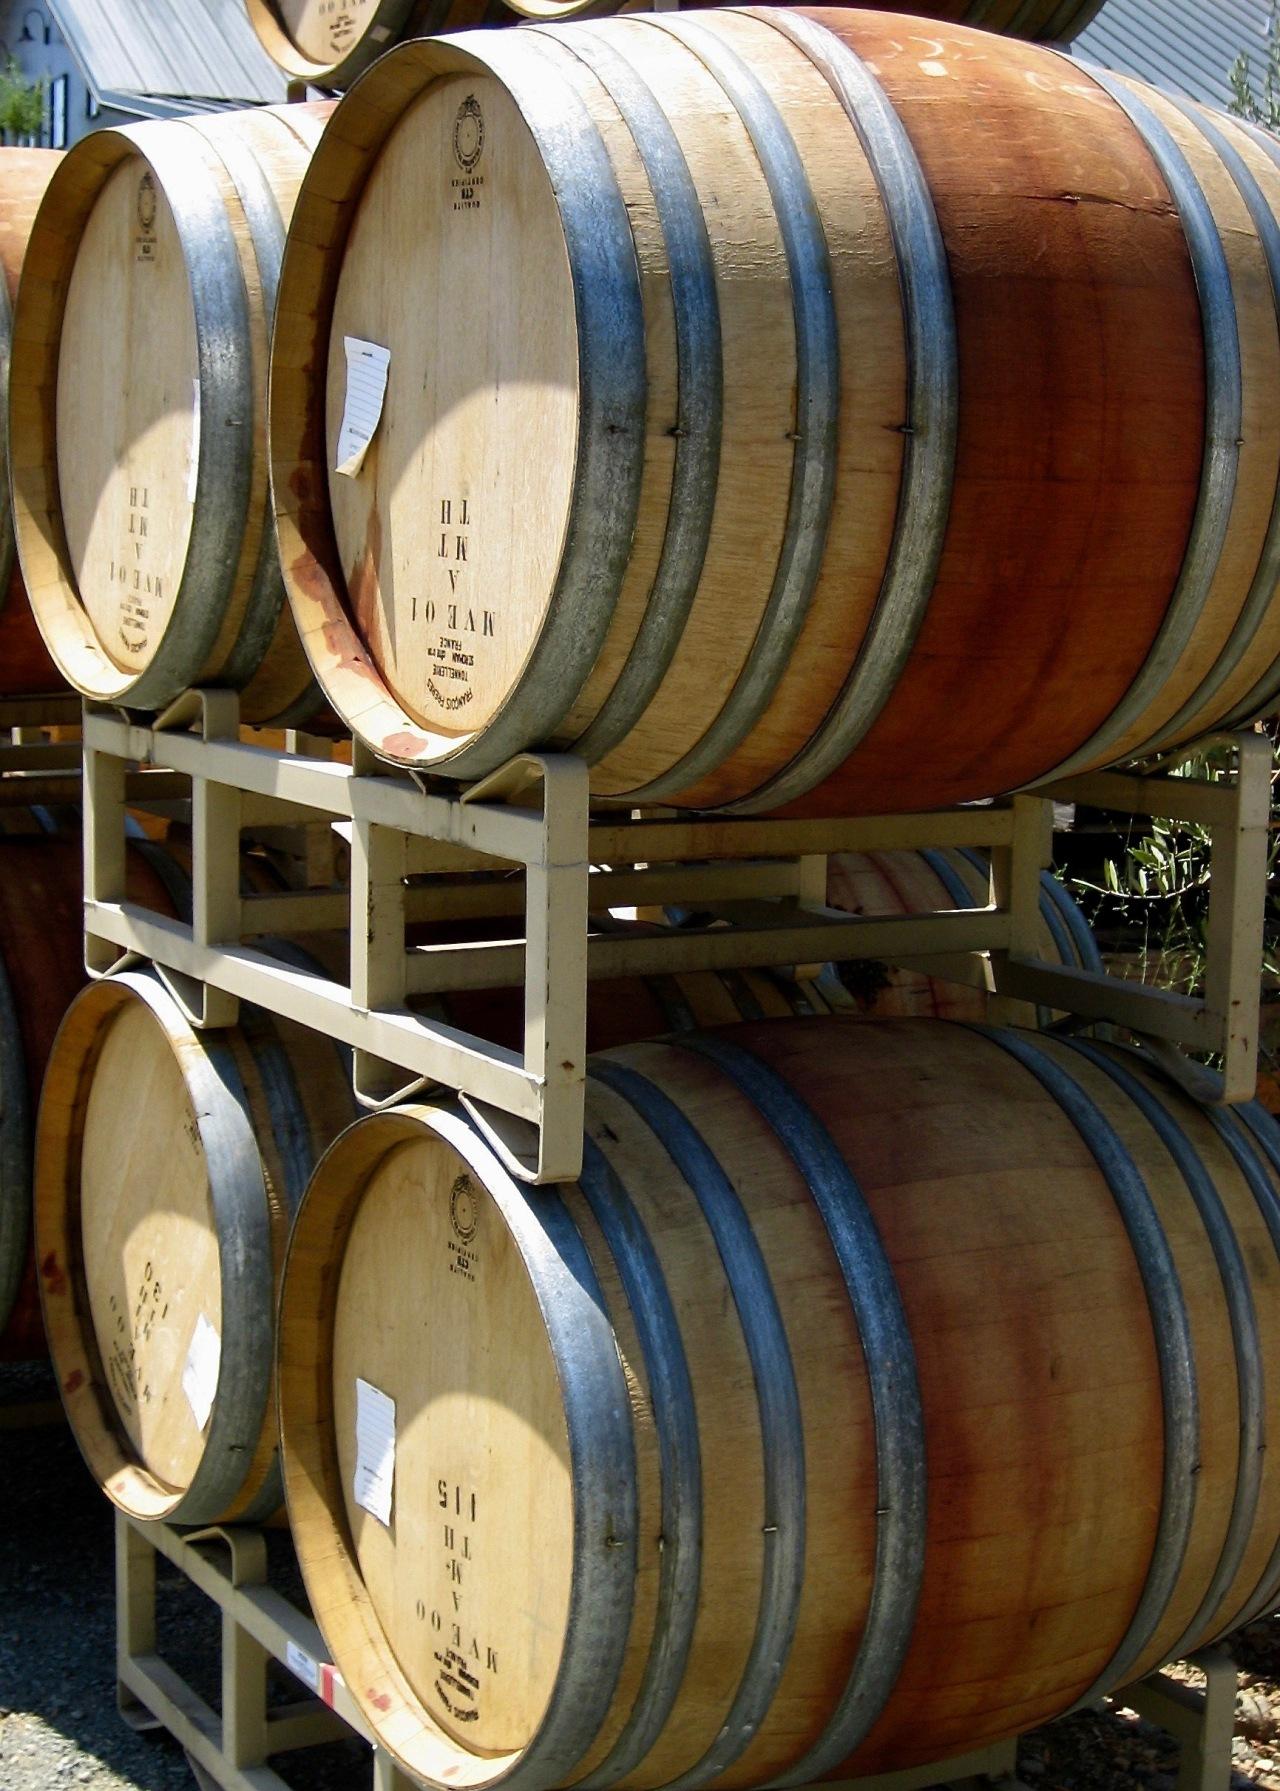 Wine Barrels Sonoma 08-2006